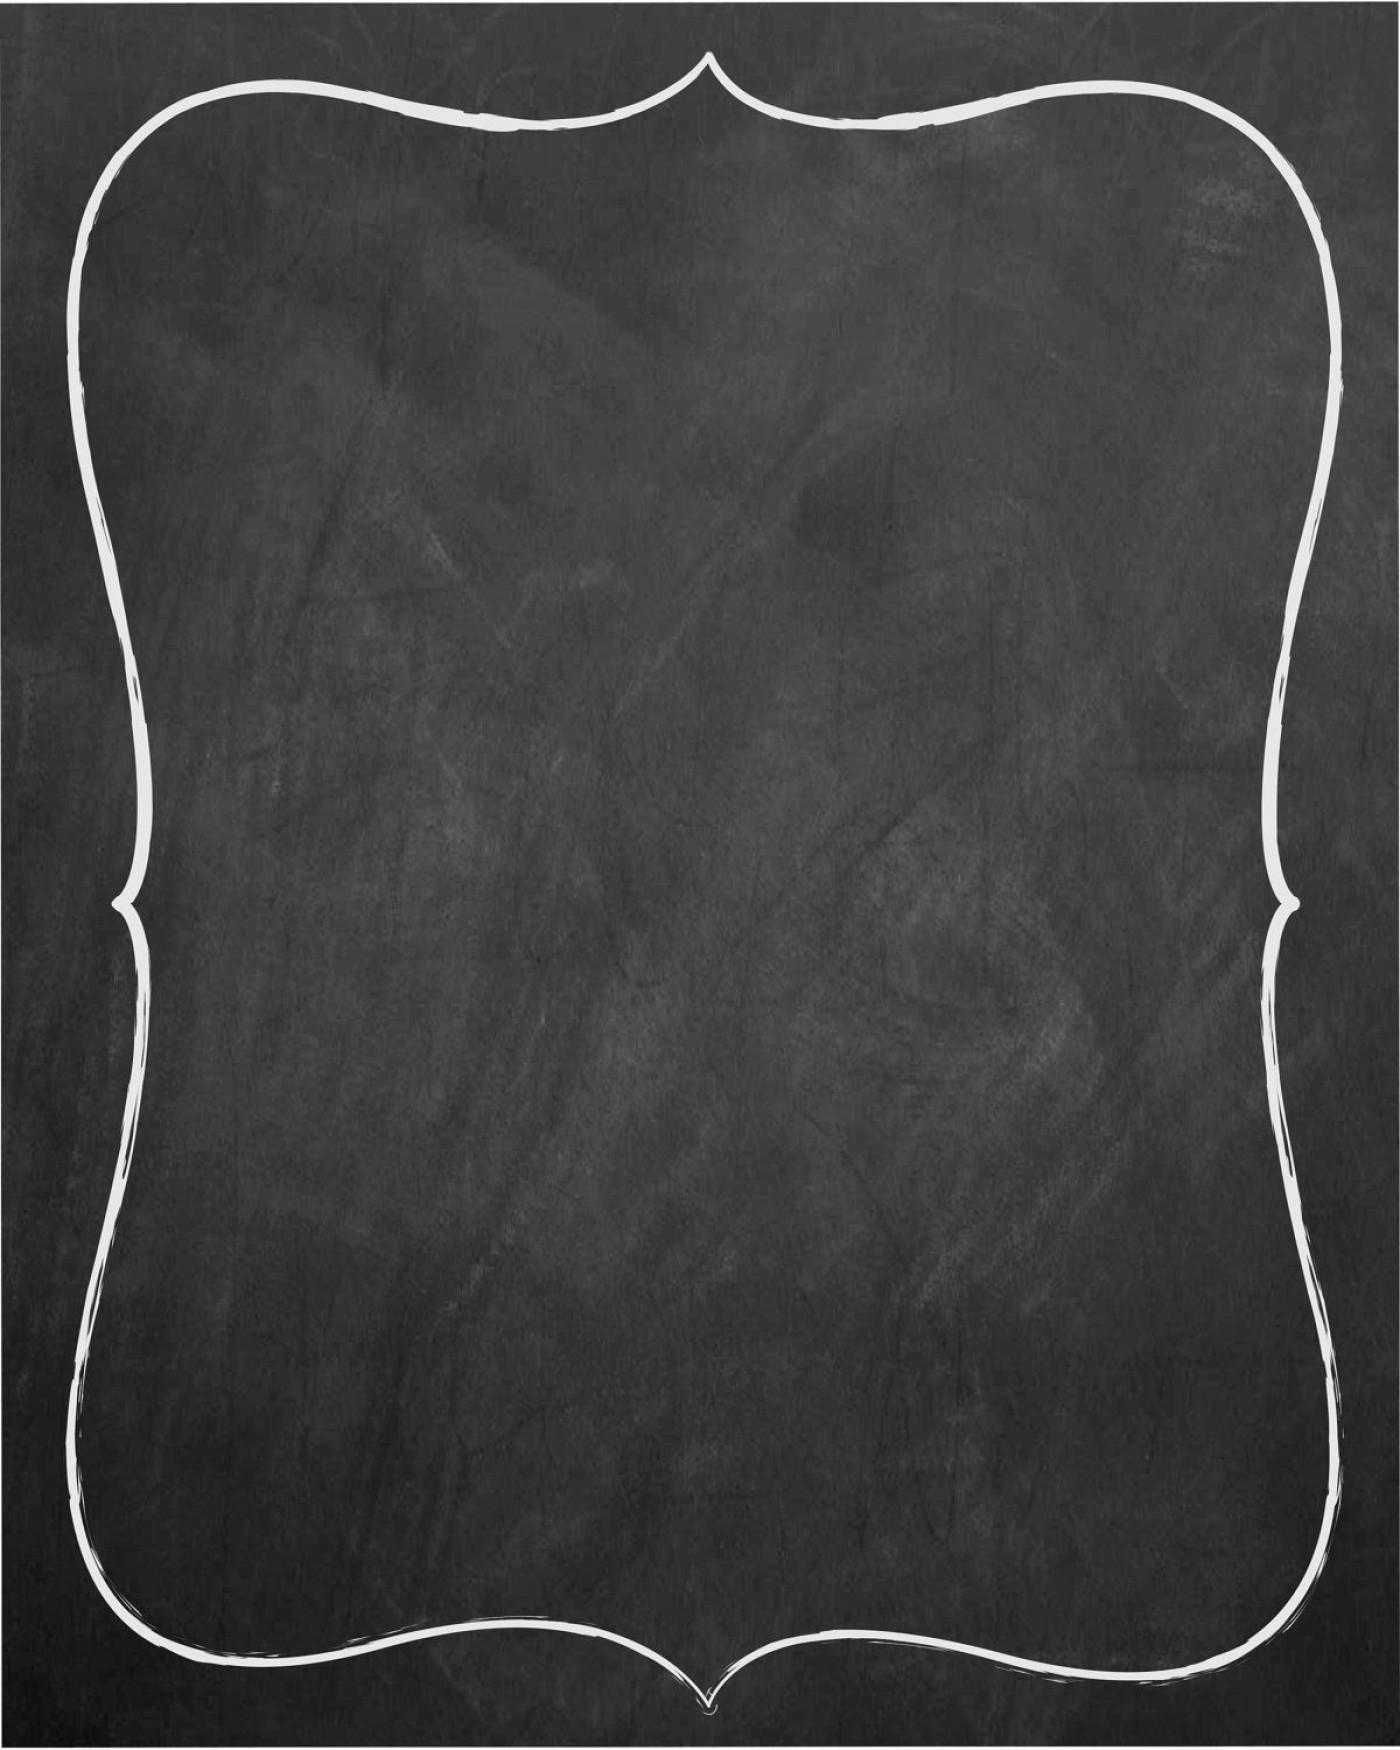 007 Unforgettable Chalkboard Invitation Template Free Idea  Wedding Editable1400